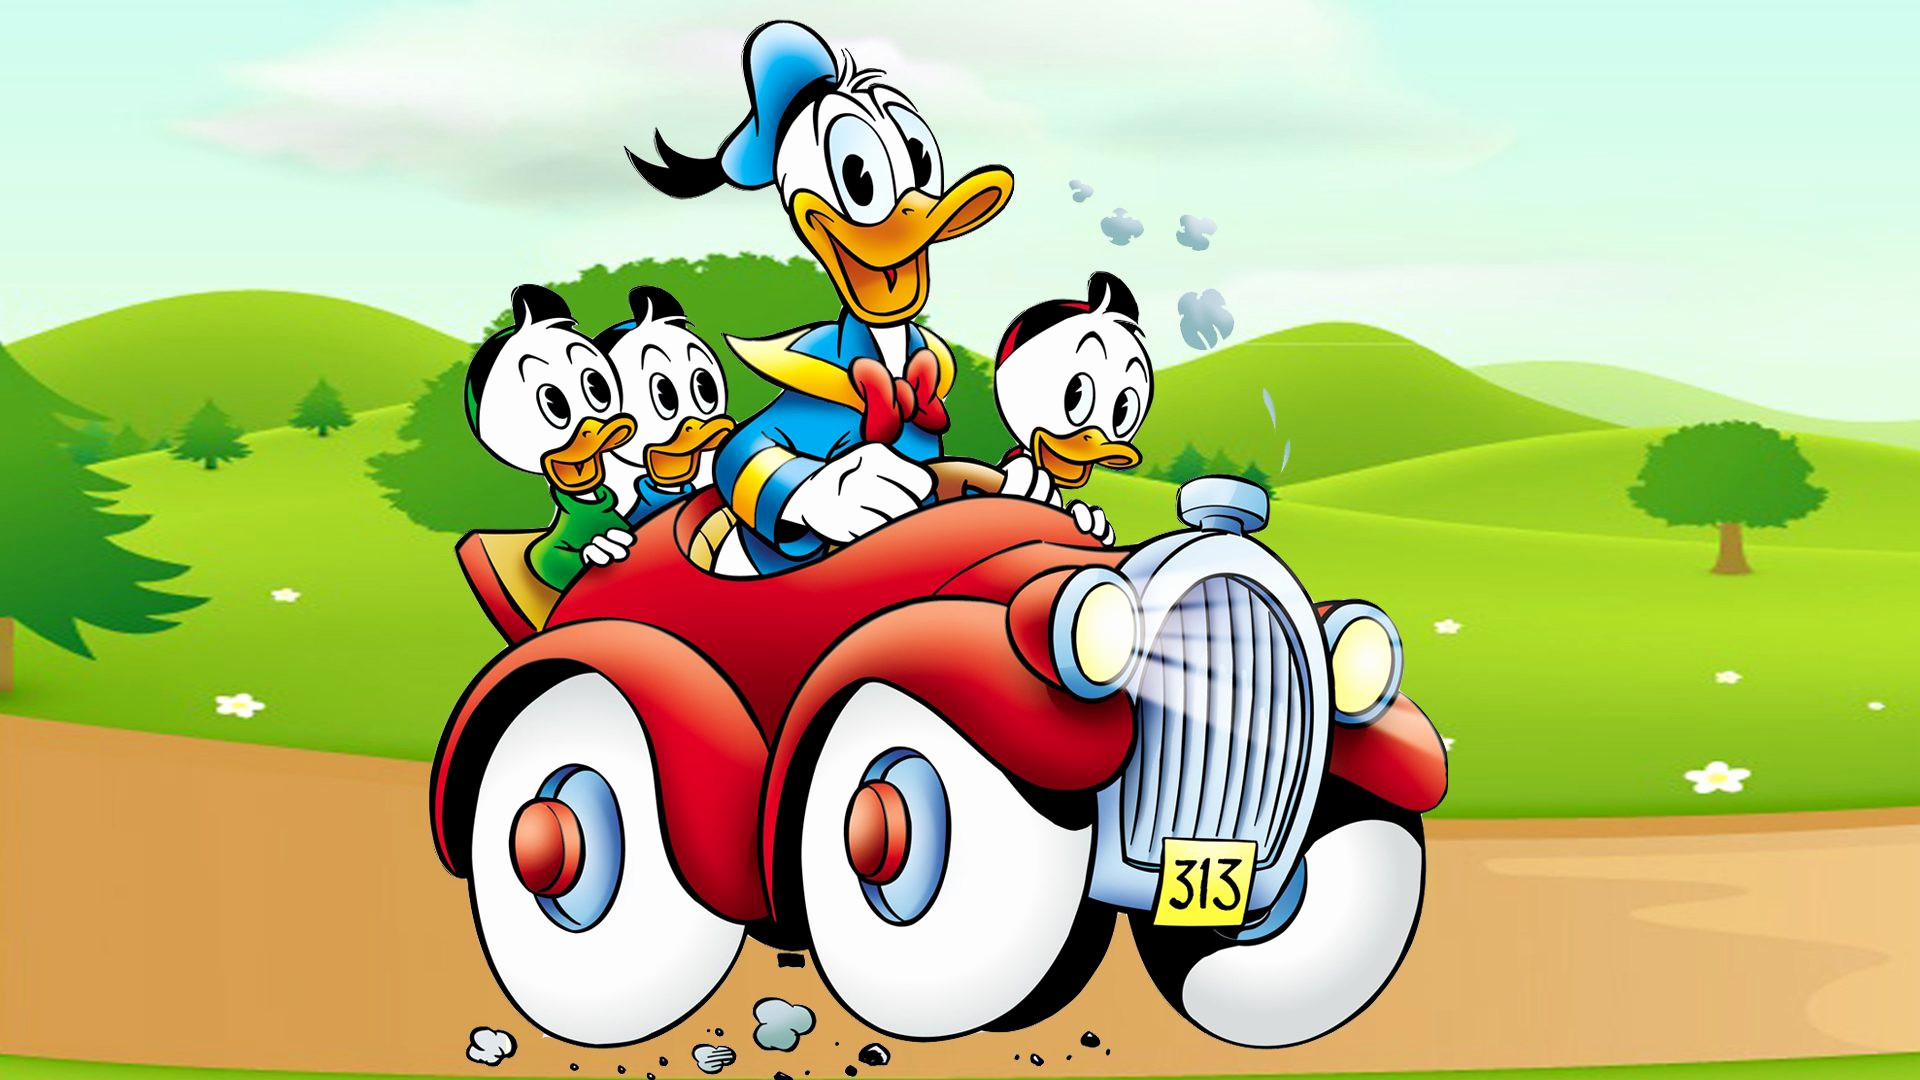 Car Cartoon Wallpaper New Donald Duck Cartoon Image Donald Duck